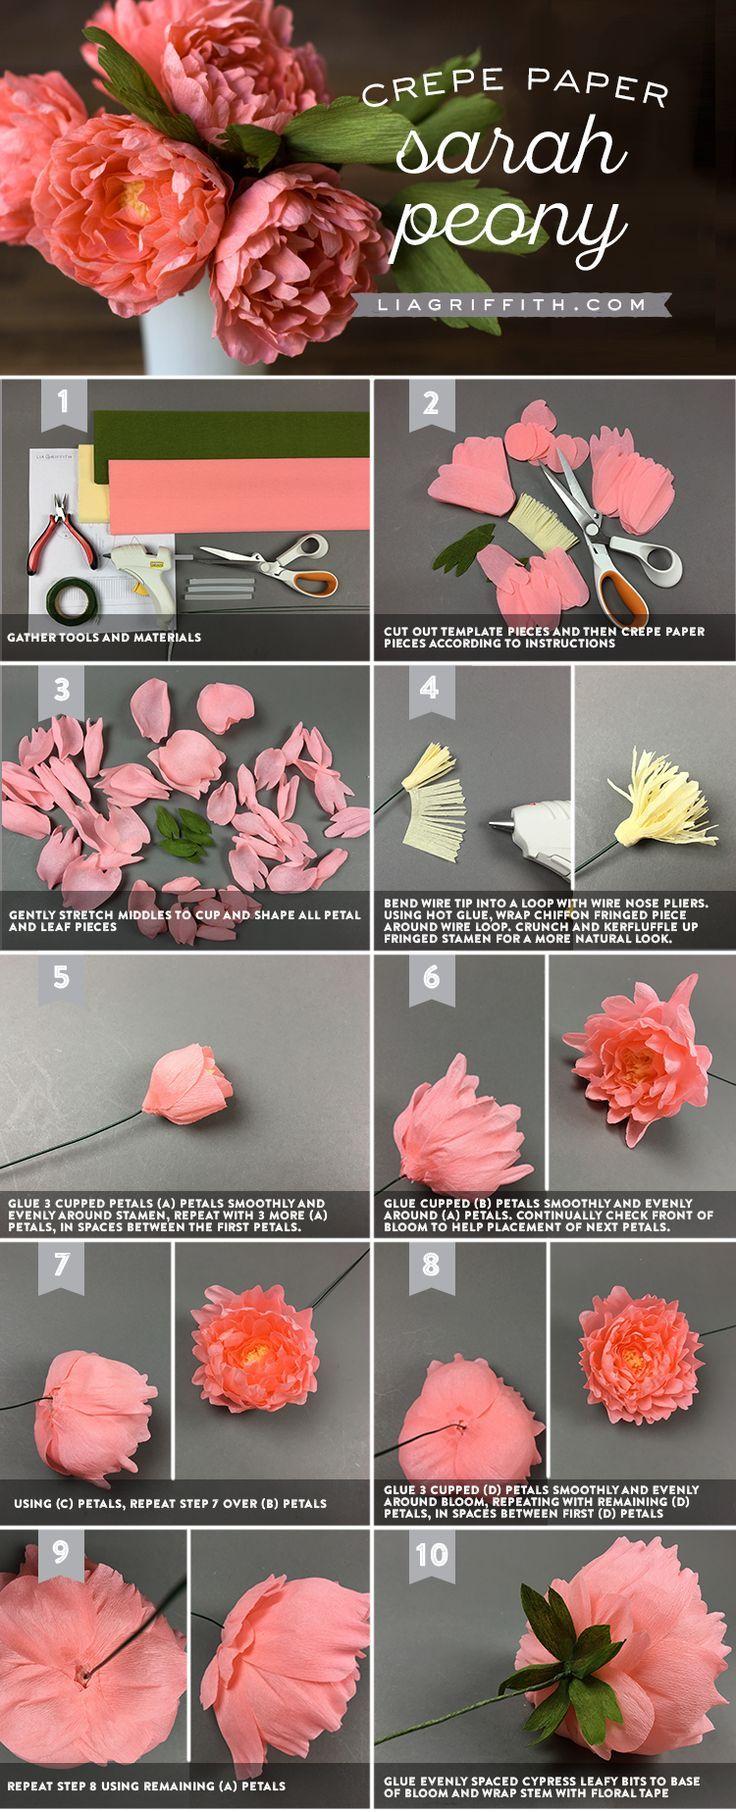 Crepe Paper Sarah Peonies Diy Wedding Ideas Pinterest Paper